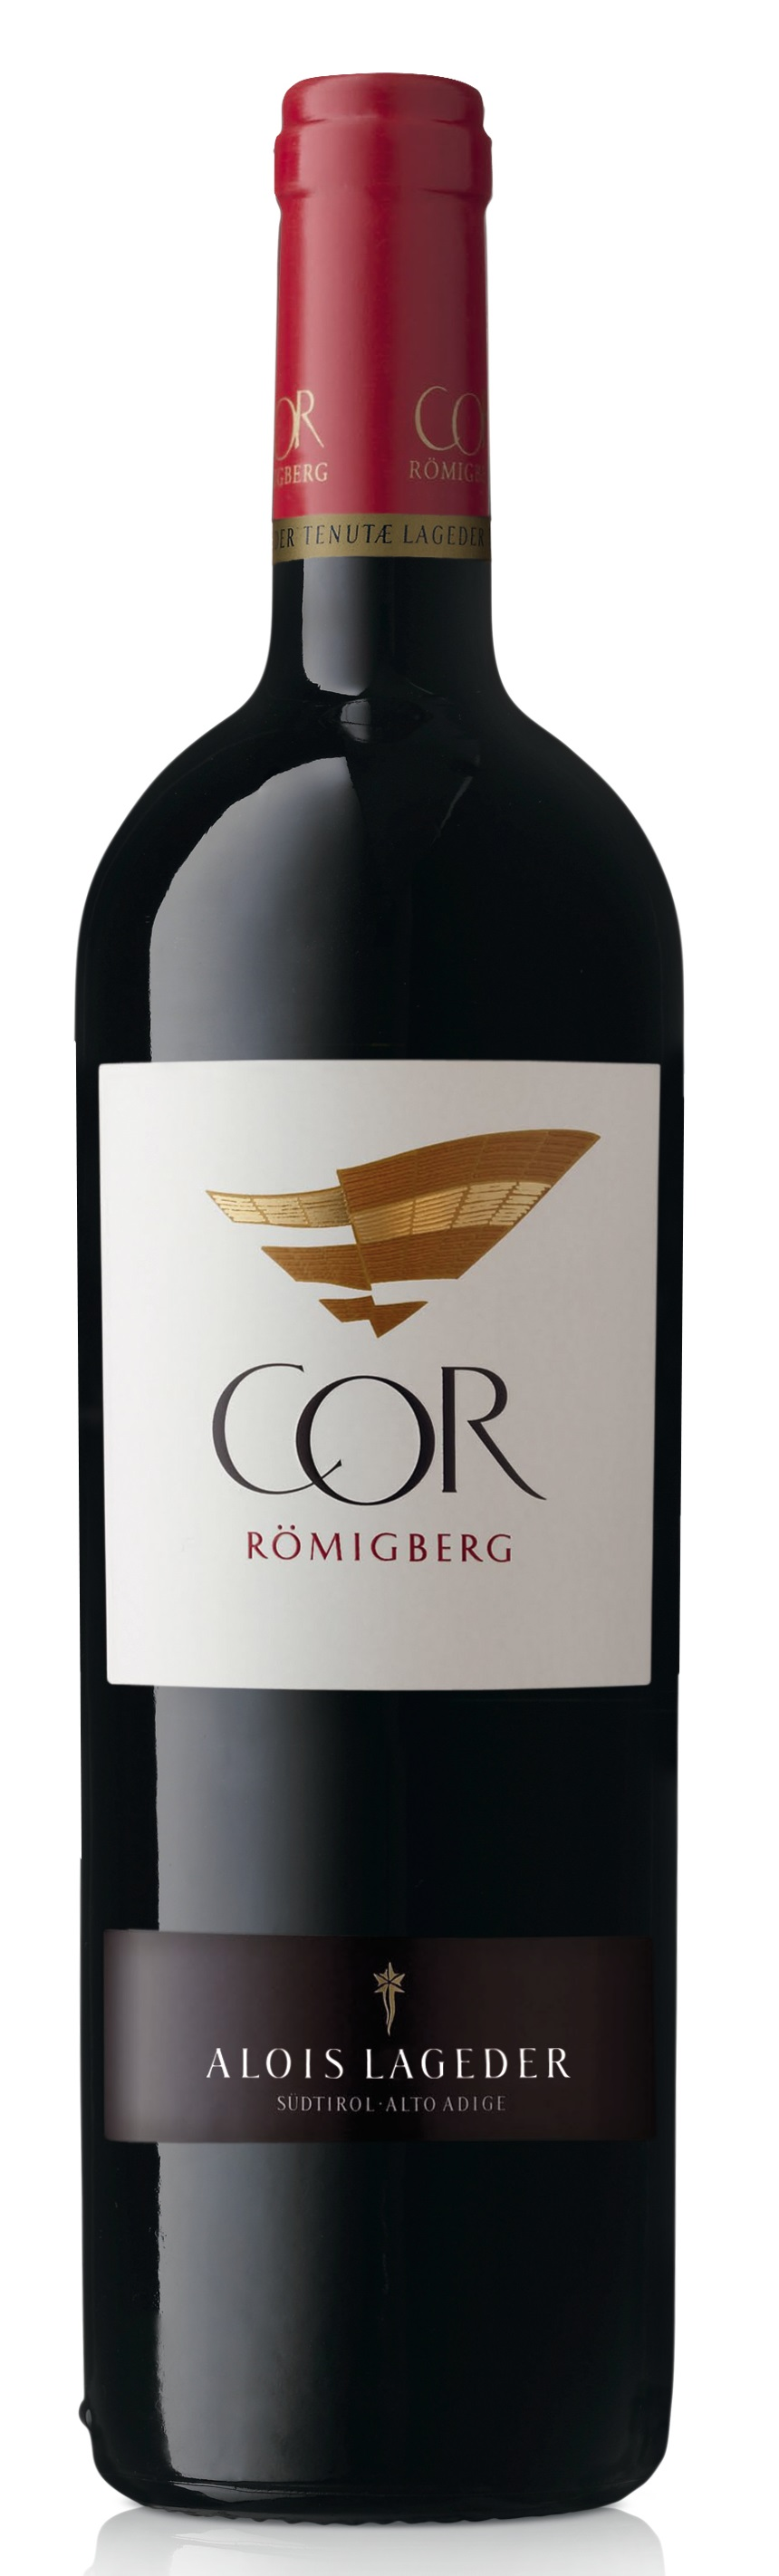 Cor Römigberg 2016